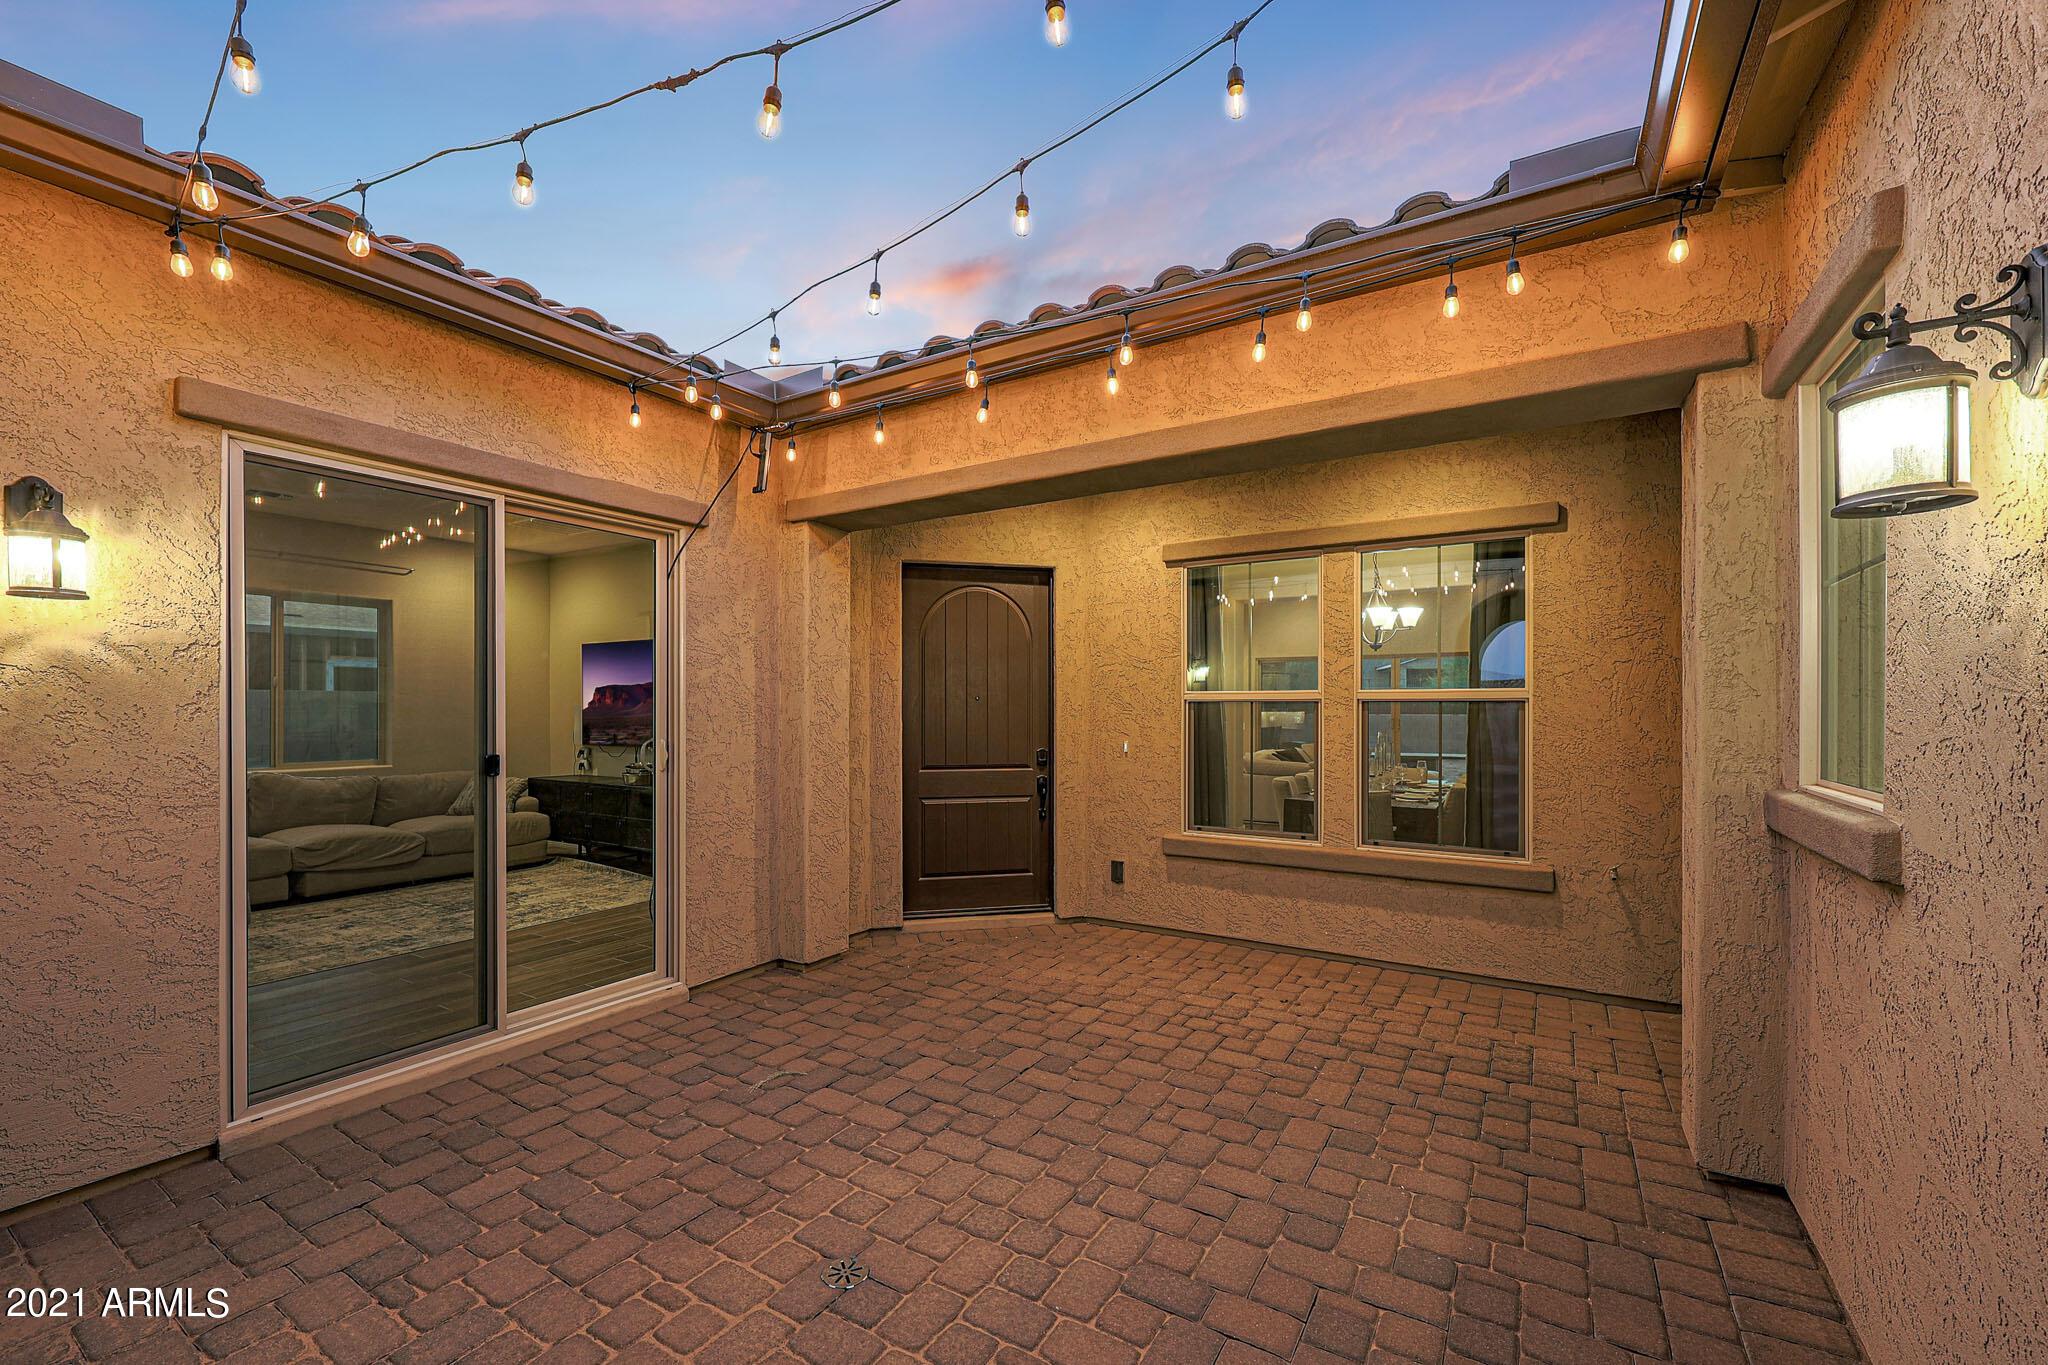 MLS 6310726 4632 N 183rd Avenue, Goodyear, AZ 85395 Goodyear AZ Luxury